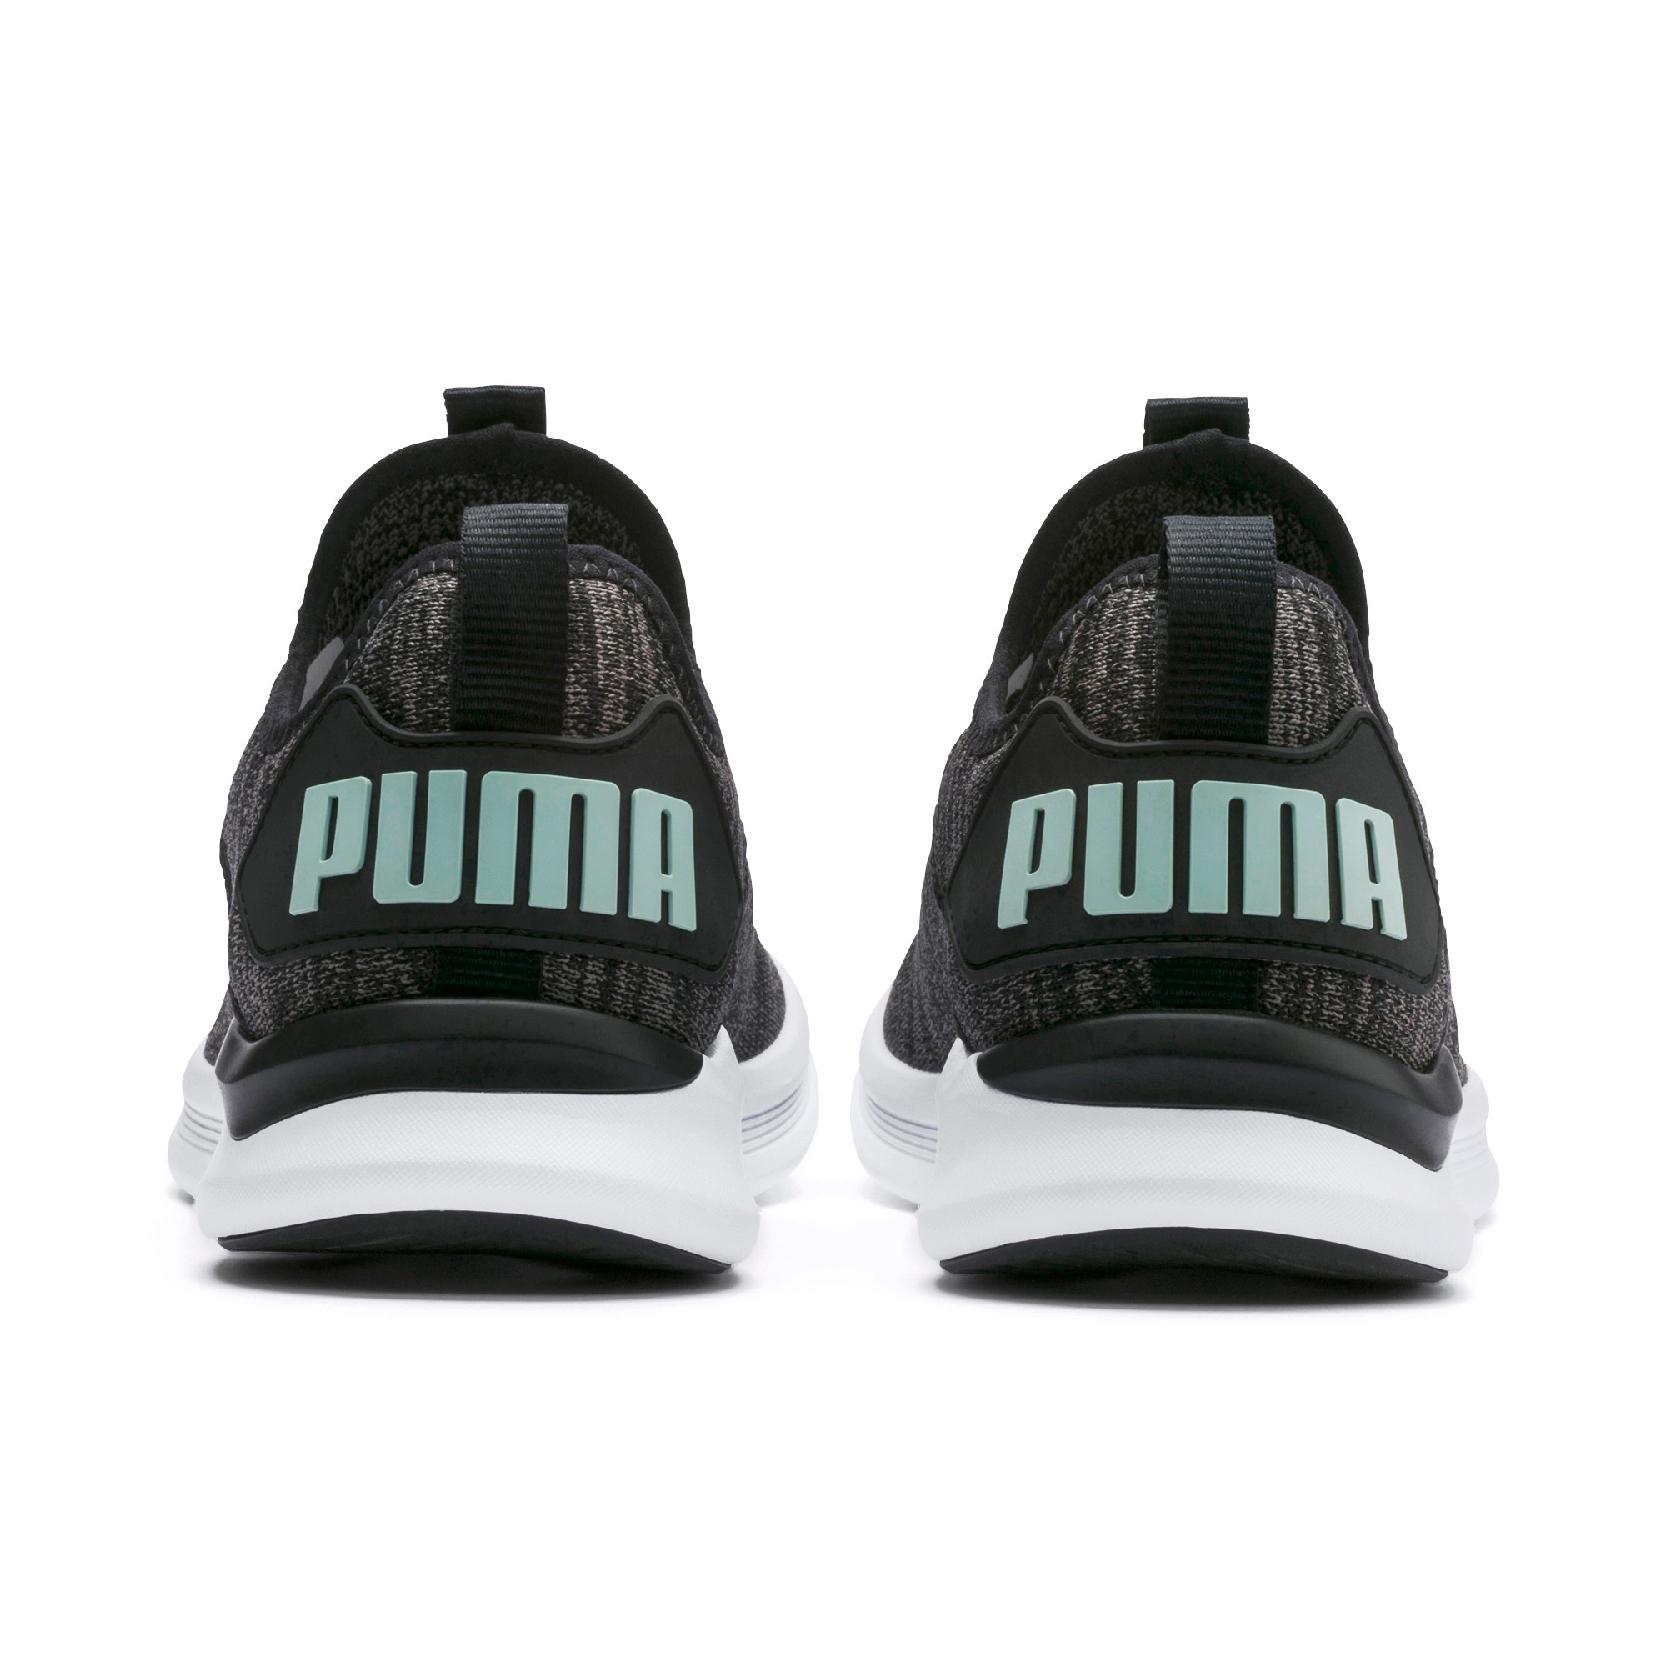 Puma IGNITE Flash EvoKNIT Fitnessschuh Herren Khaki, Schwarz